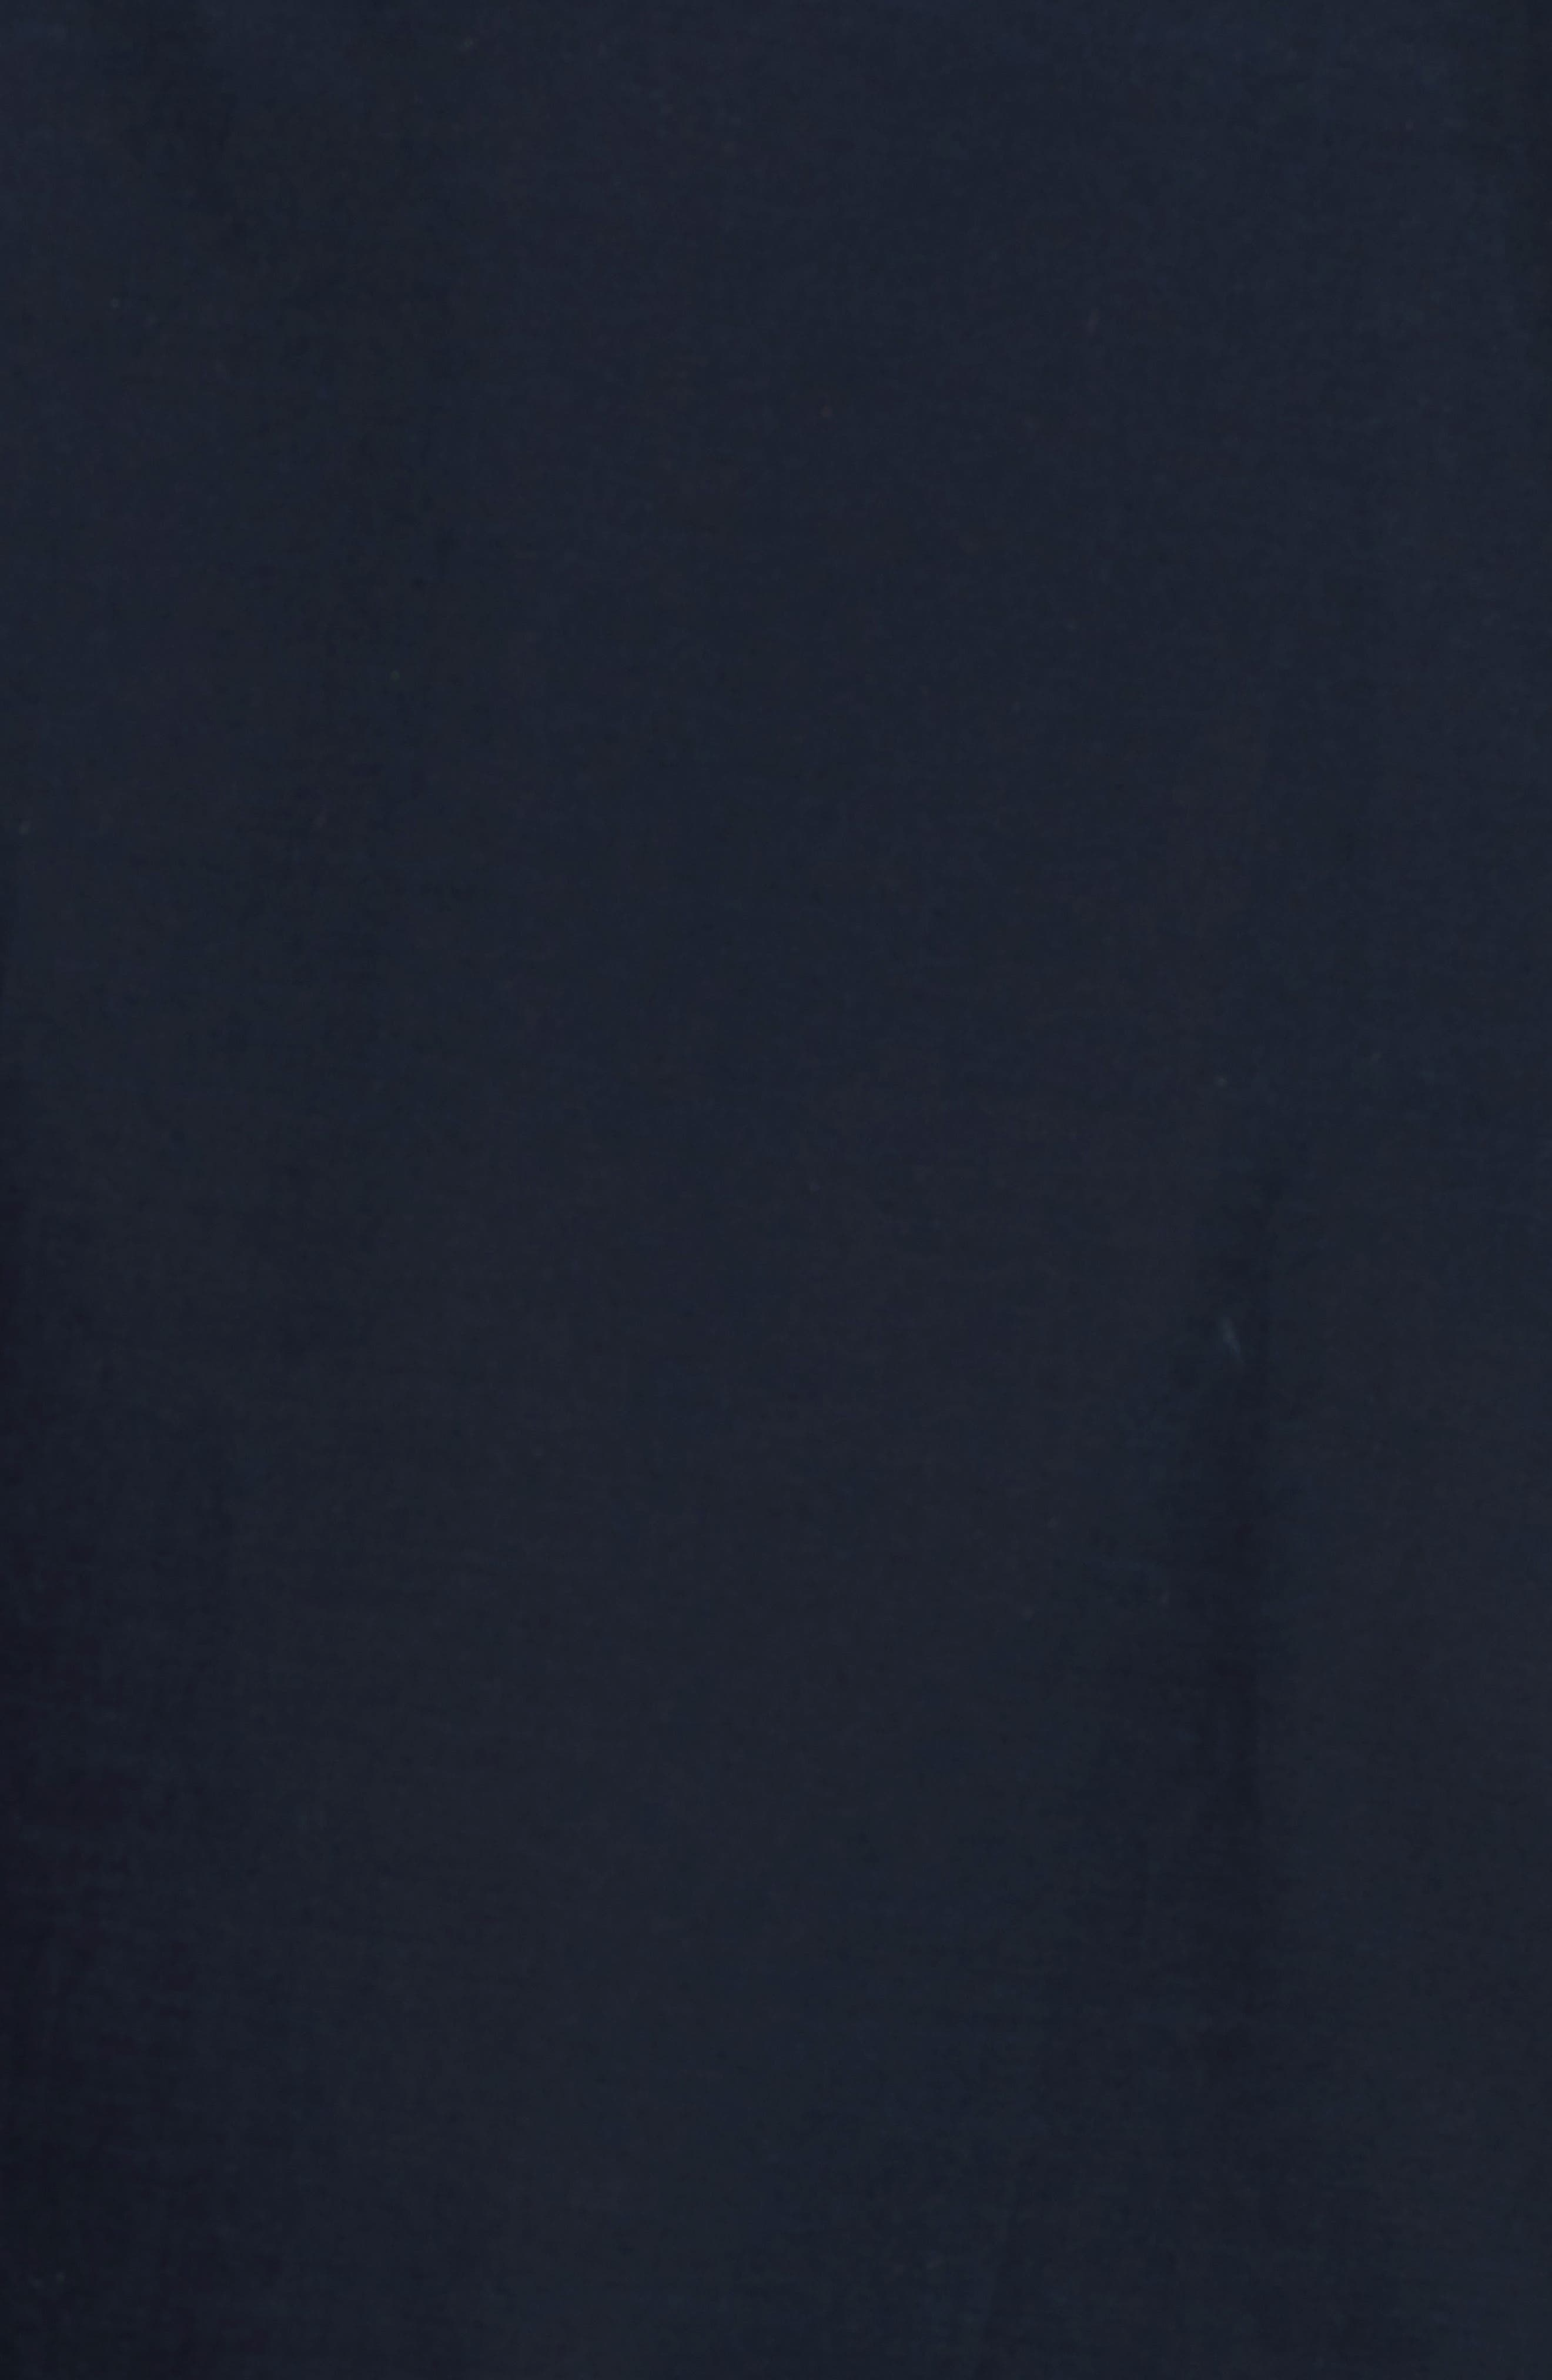 Ruffle Cotton A-Line Skirt,                             Alternate thumbnail 3, color,                             Navy